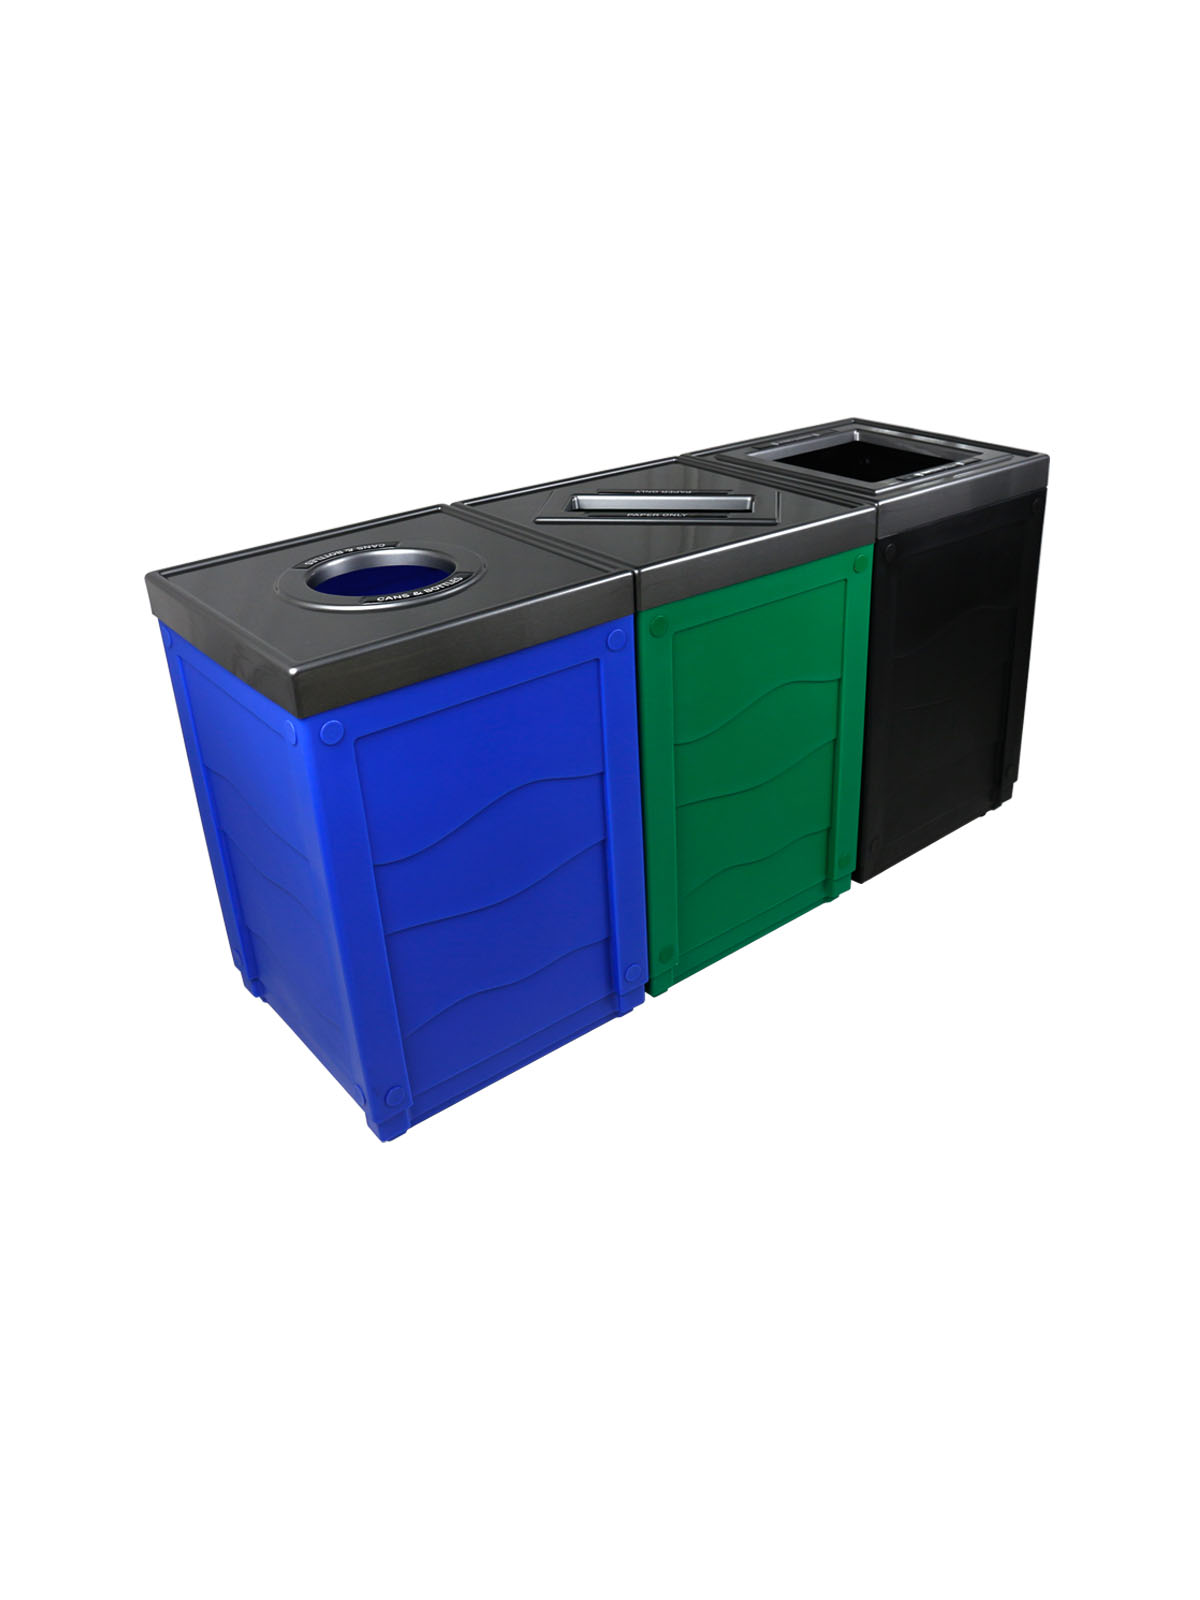 EVOLVE - Triple - Cans & Bottles-Paper-Waste - Circle-Slot-Full - Blue-Green-Black